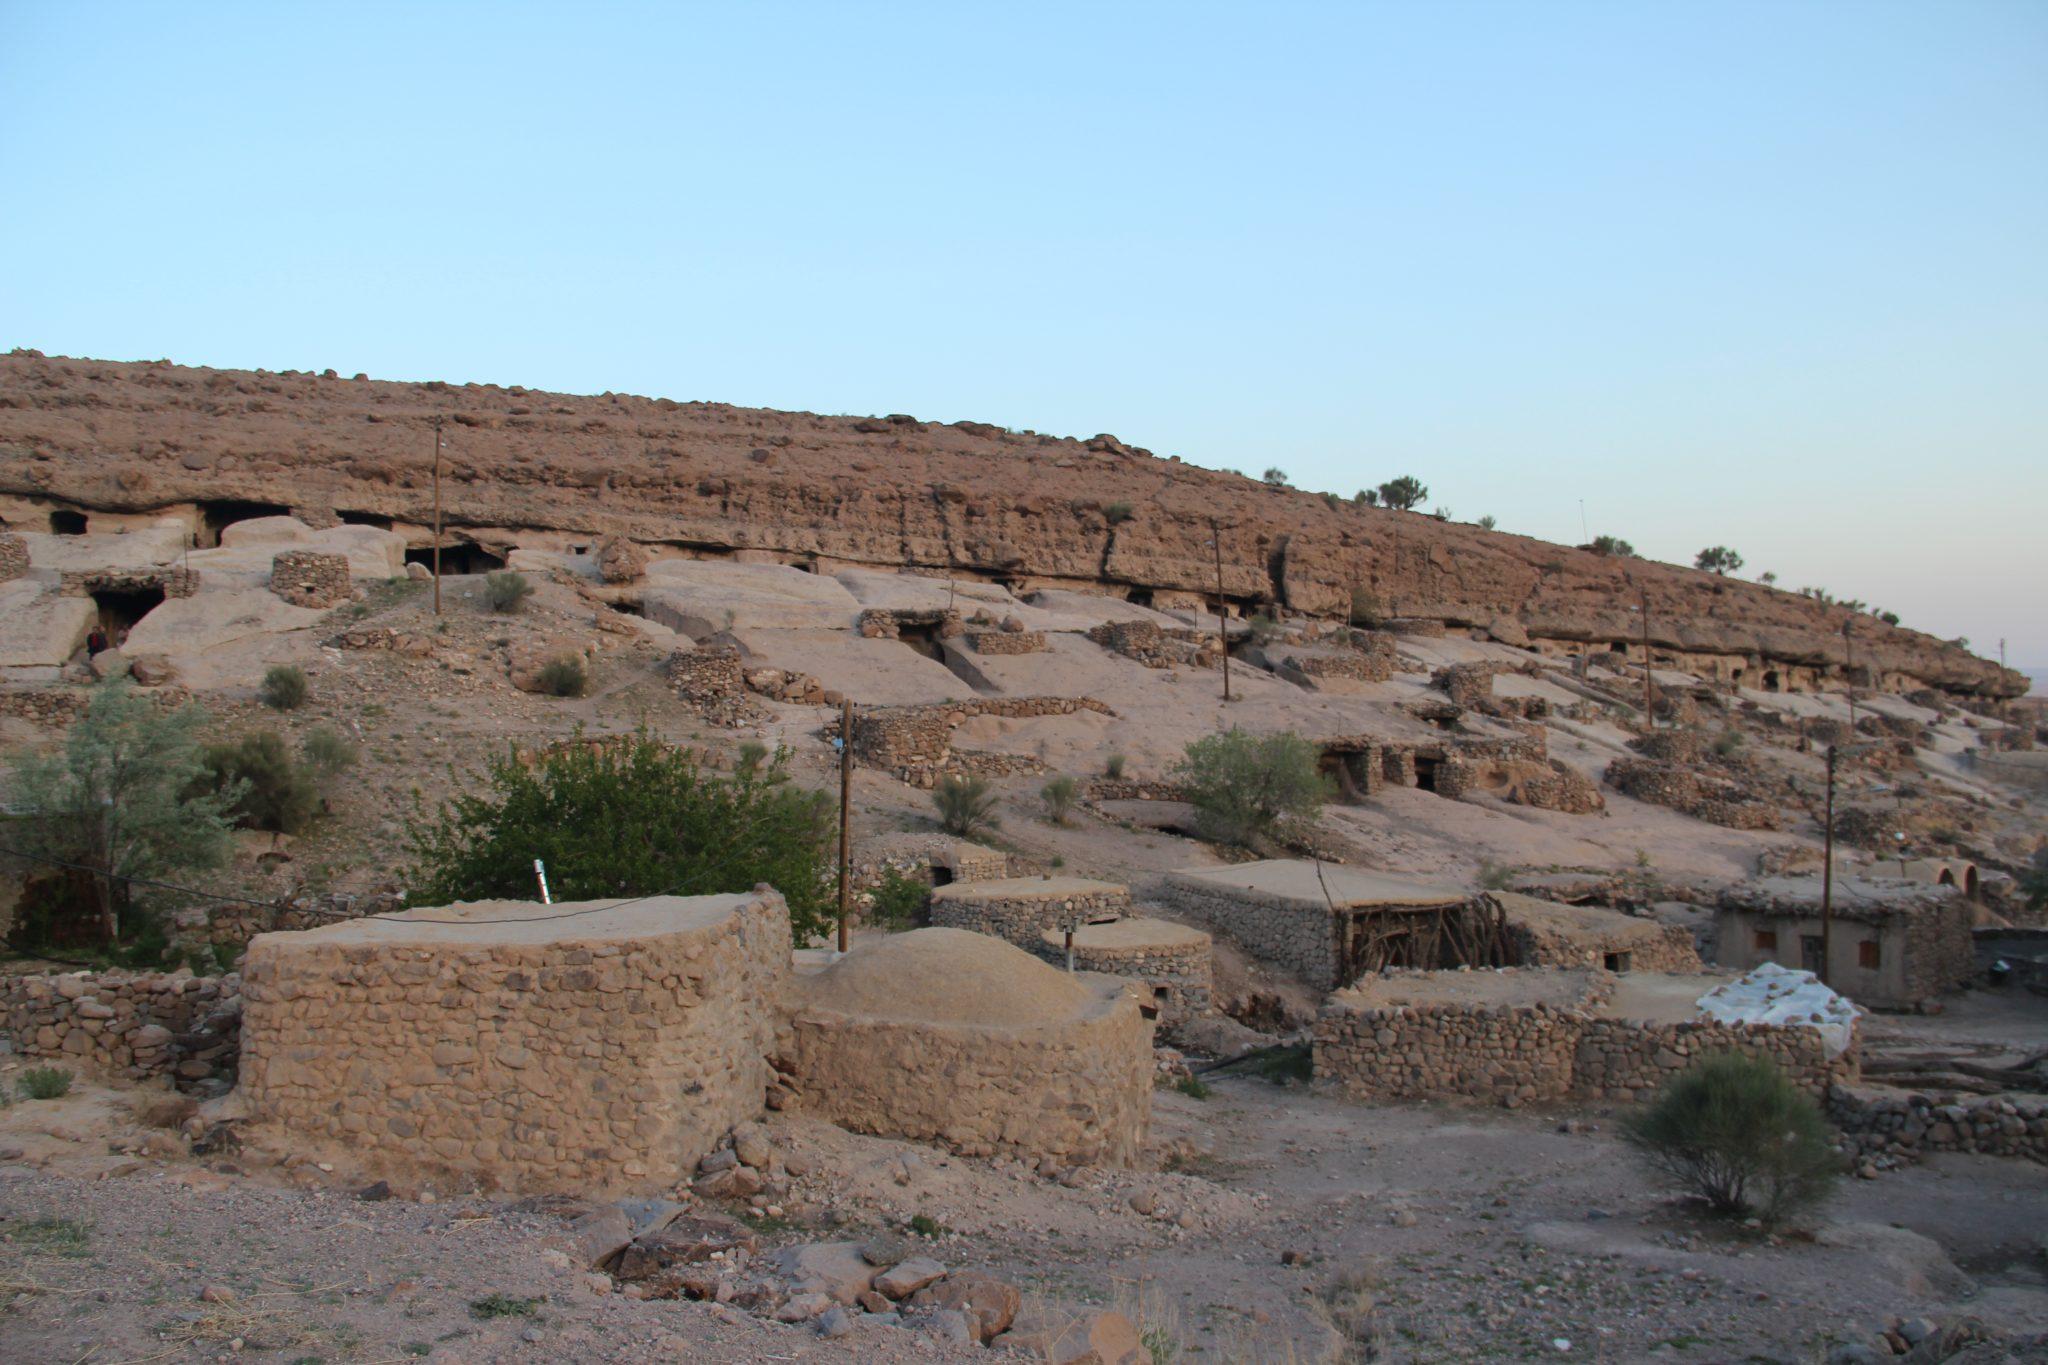 Visiter l'ancienne ville troglodyte de Meymand